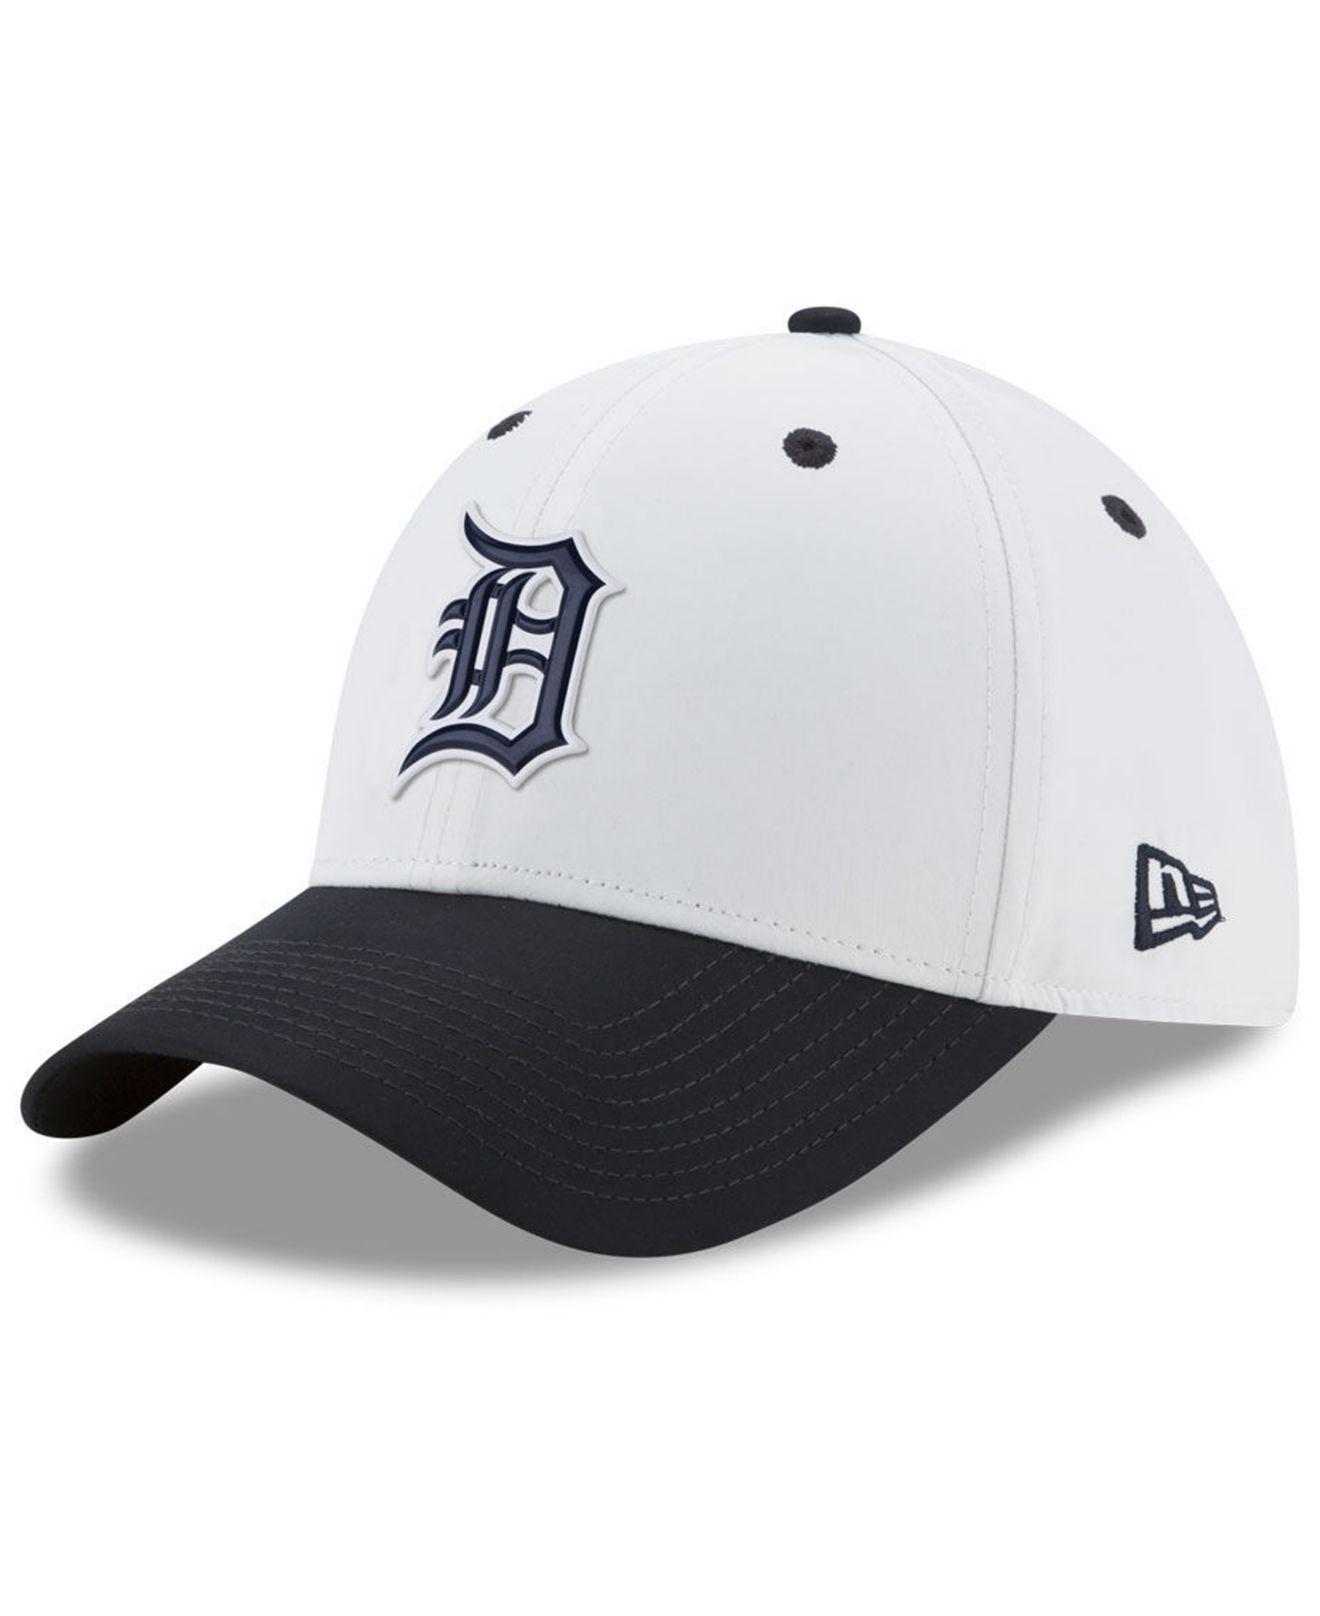 online store 86501 9aeba ... sale buy los angeles dodgers new era mlb batting practice prolight  39thirty cap caaf7 0f0f7 sweden